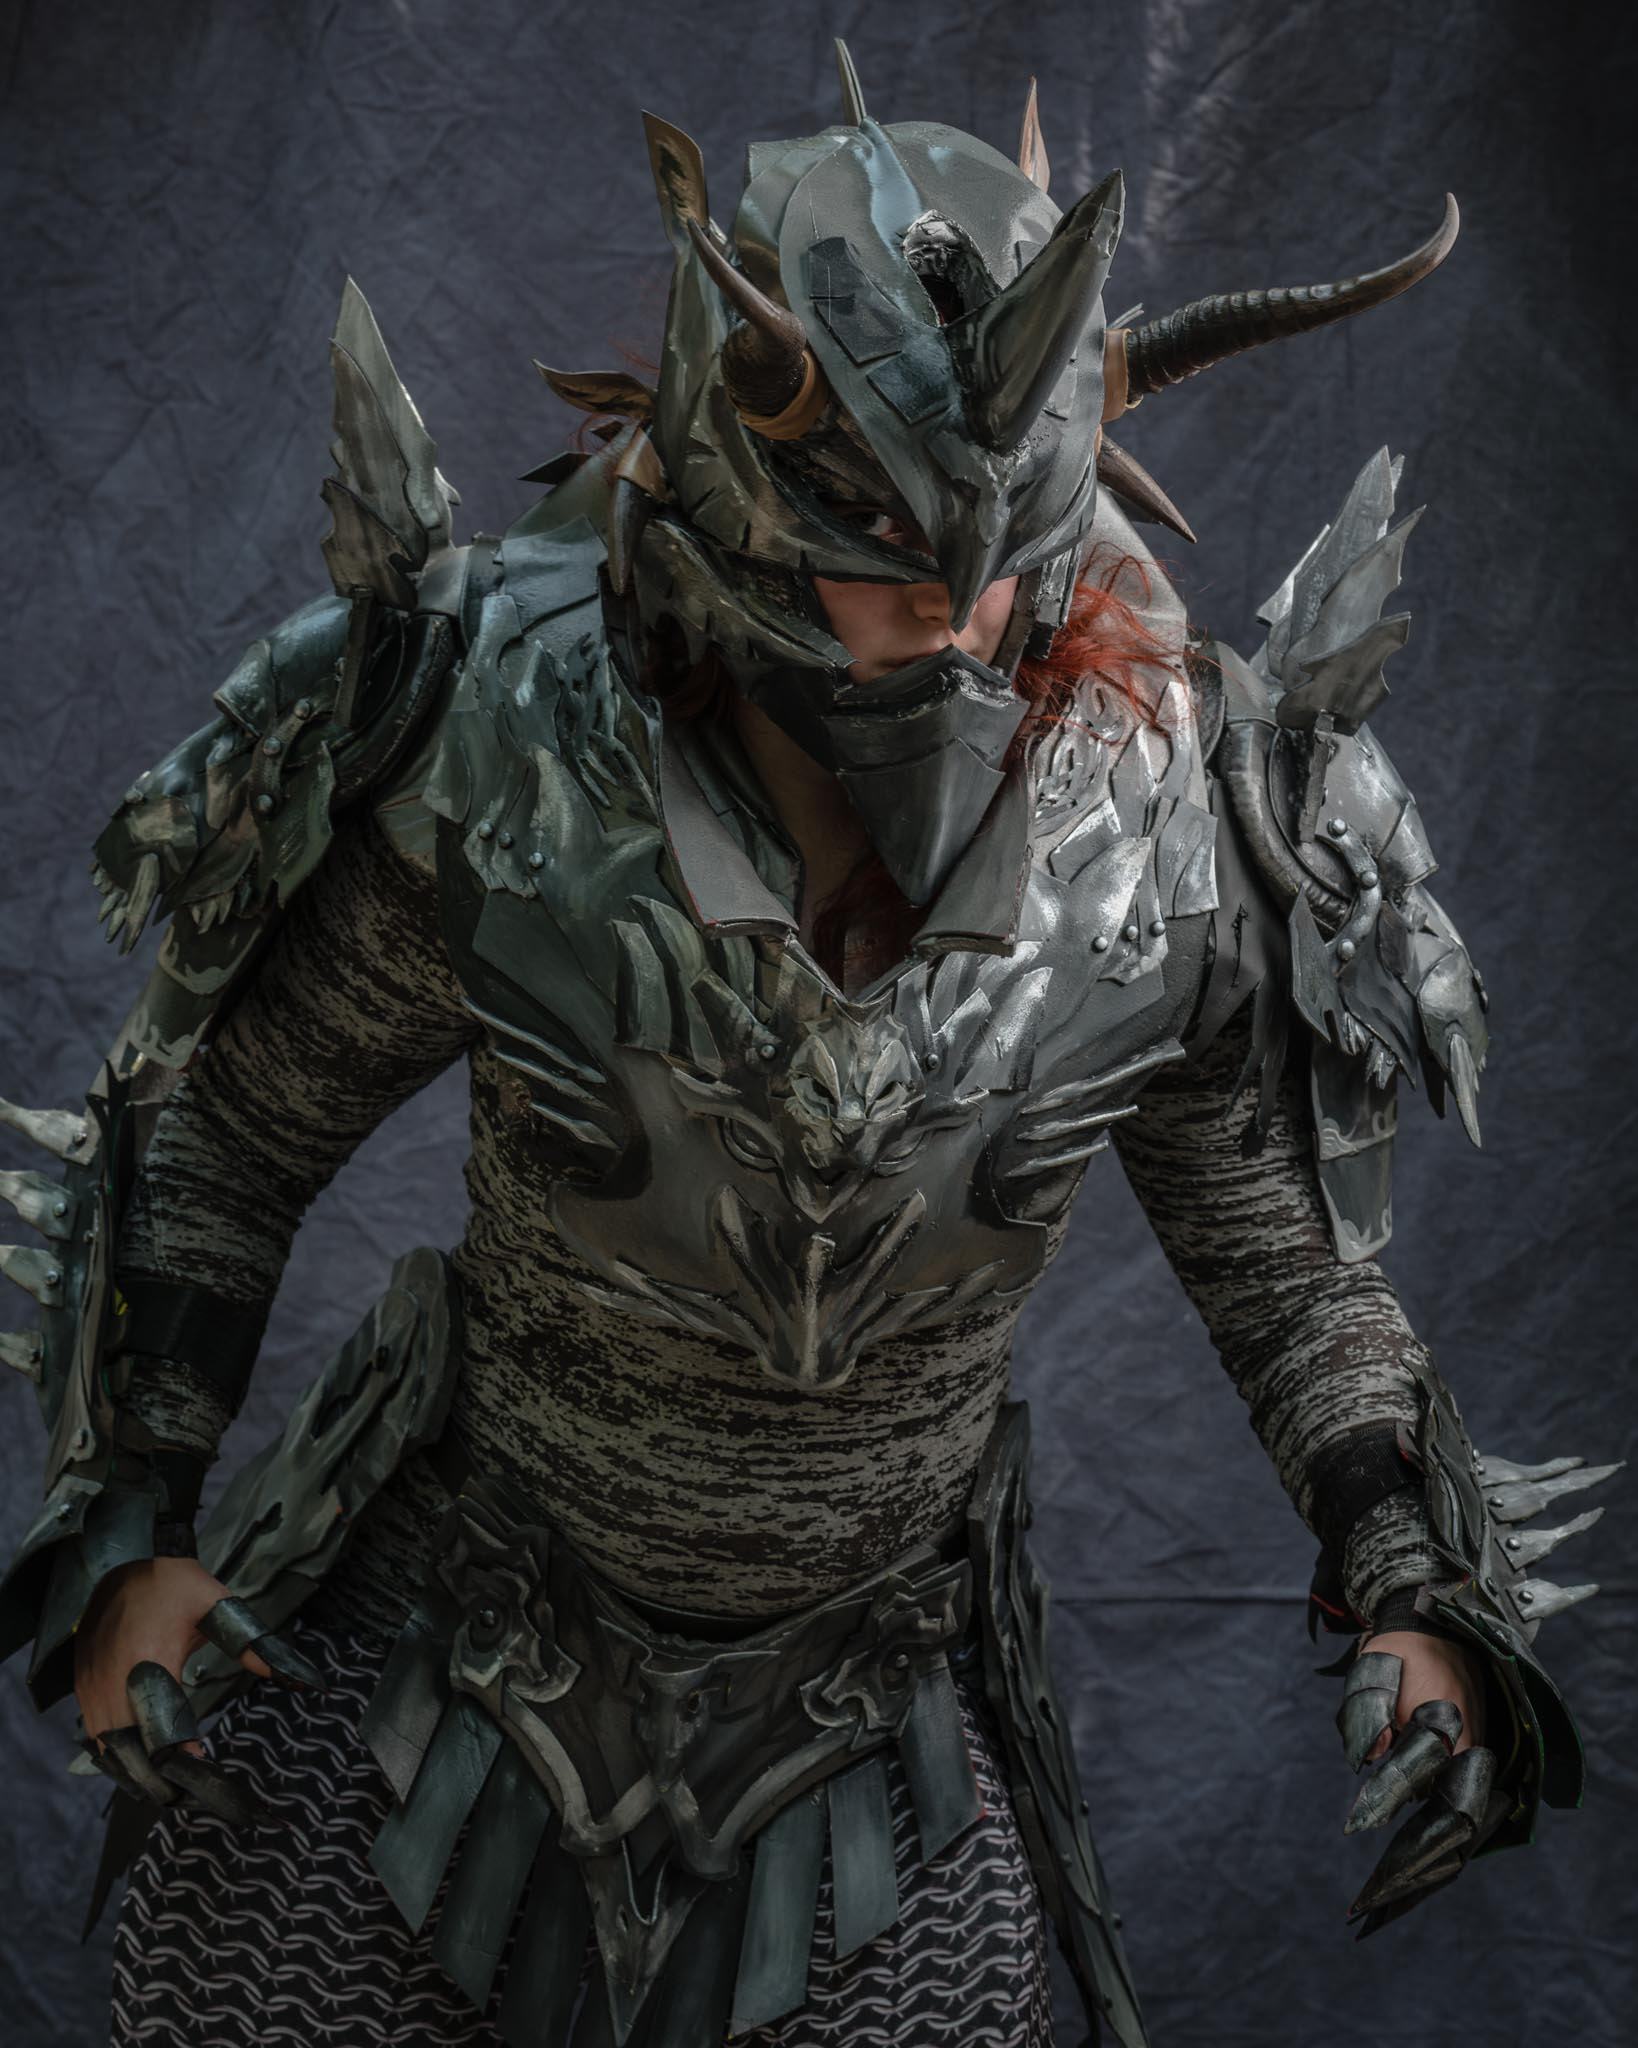 Charr Cultural Armor Tier 3 by kyrisnowpaw